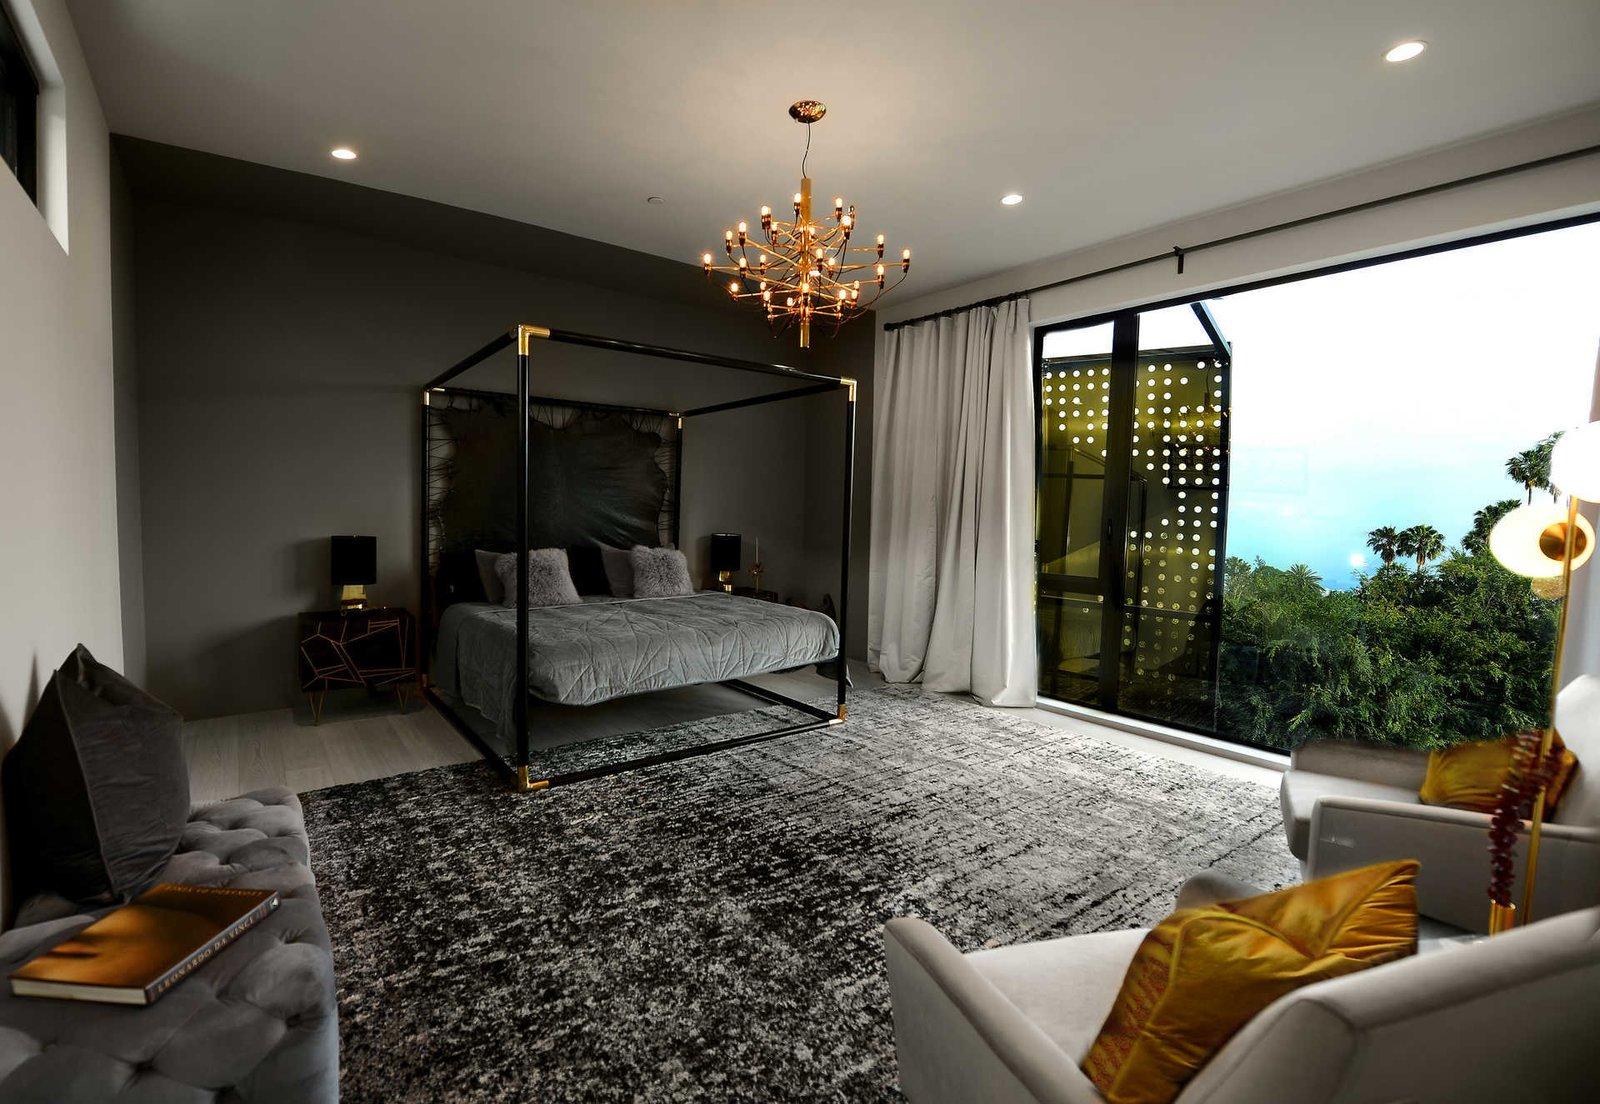 Bedroom, Ceiling Lighting, Lamps, Bed, Bench, and Light Hardwood Floor  Italian Modernist Home